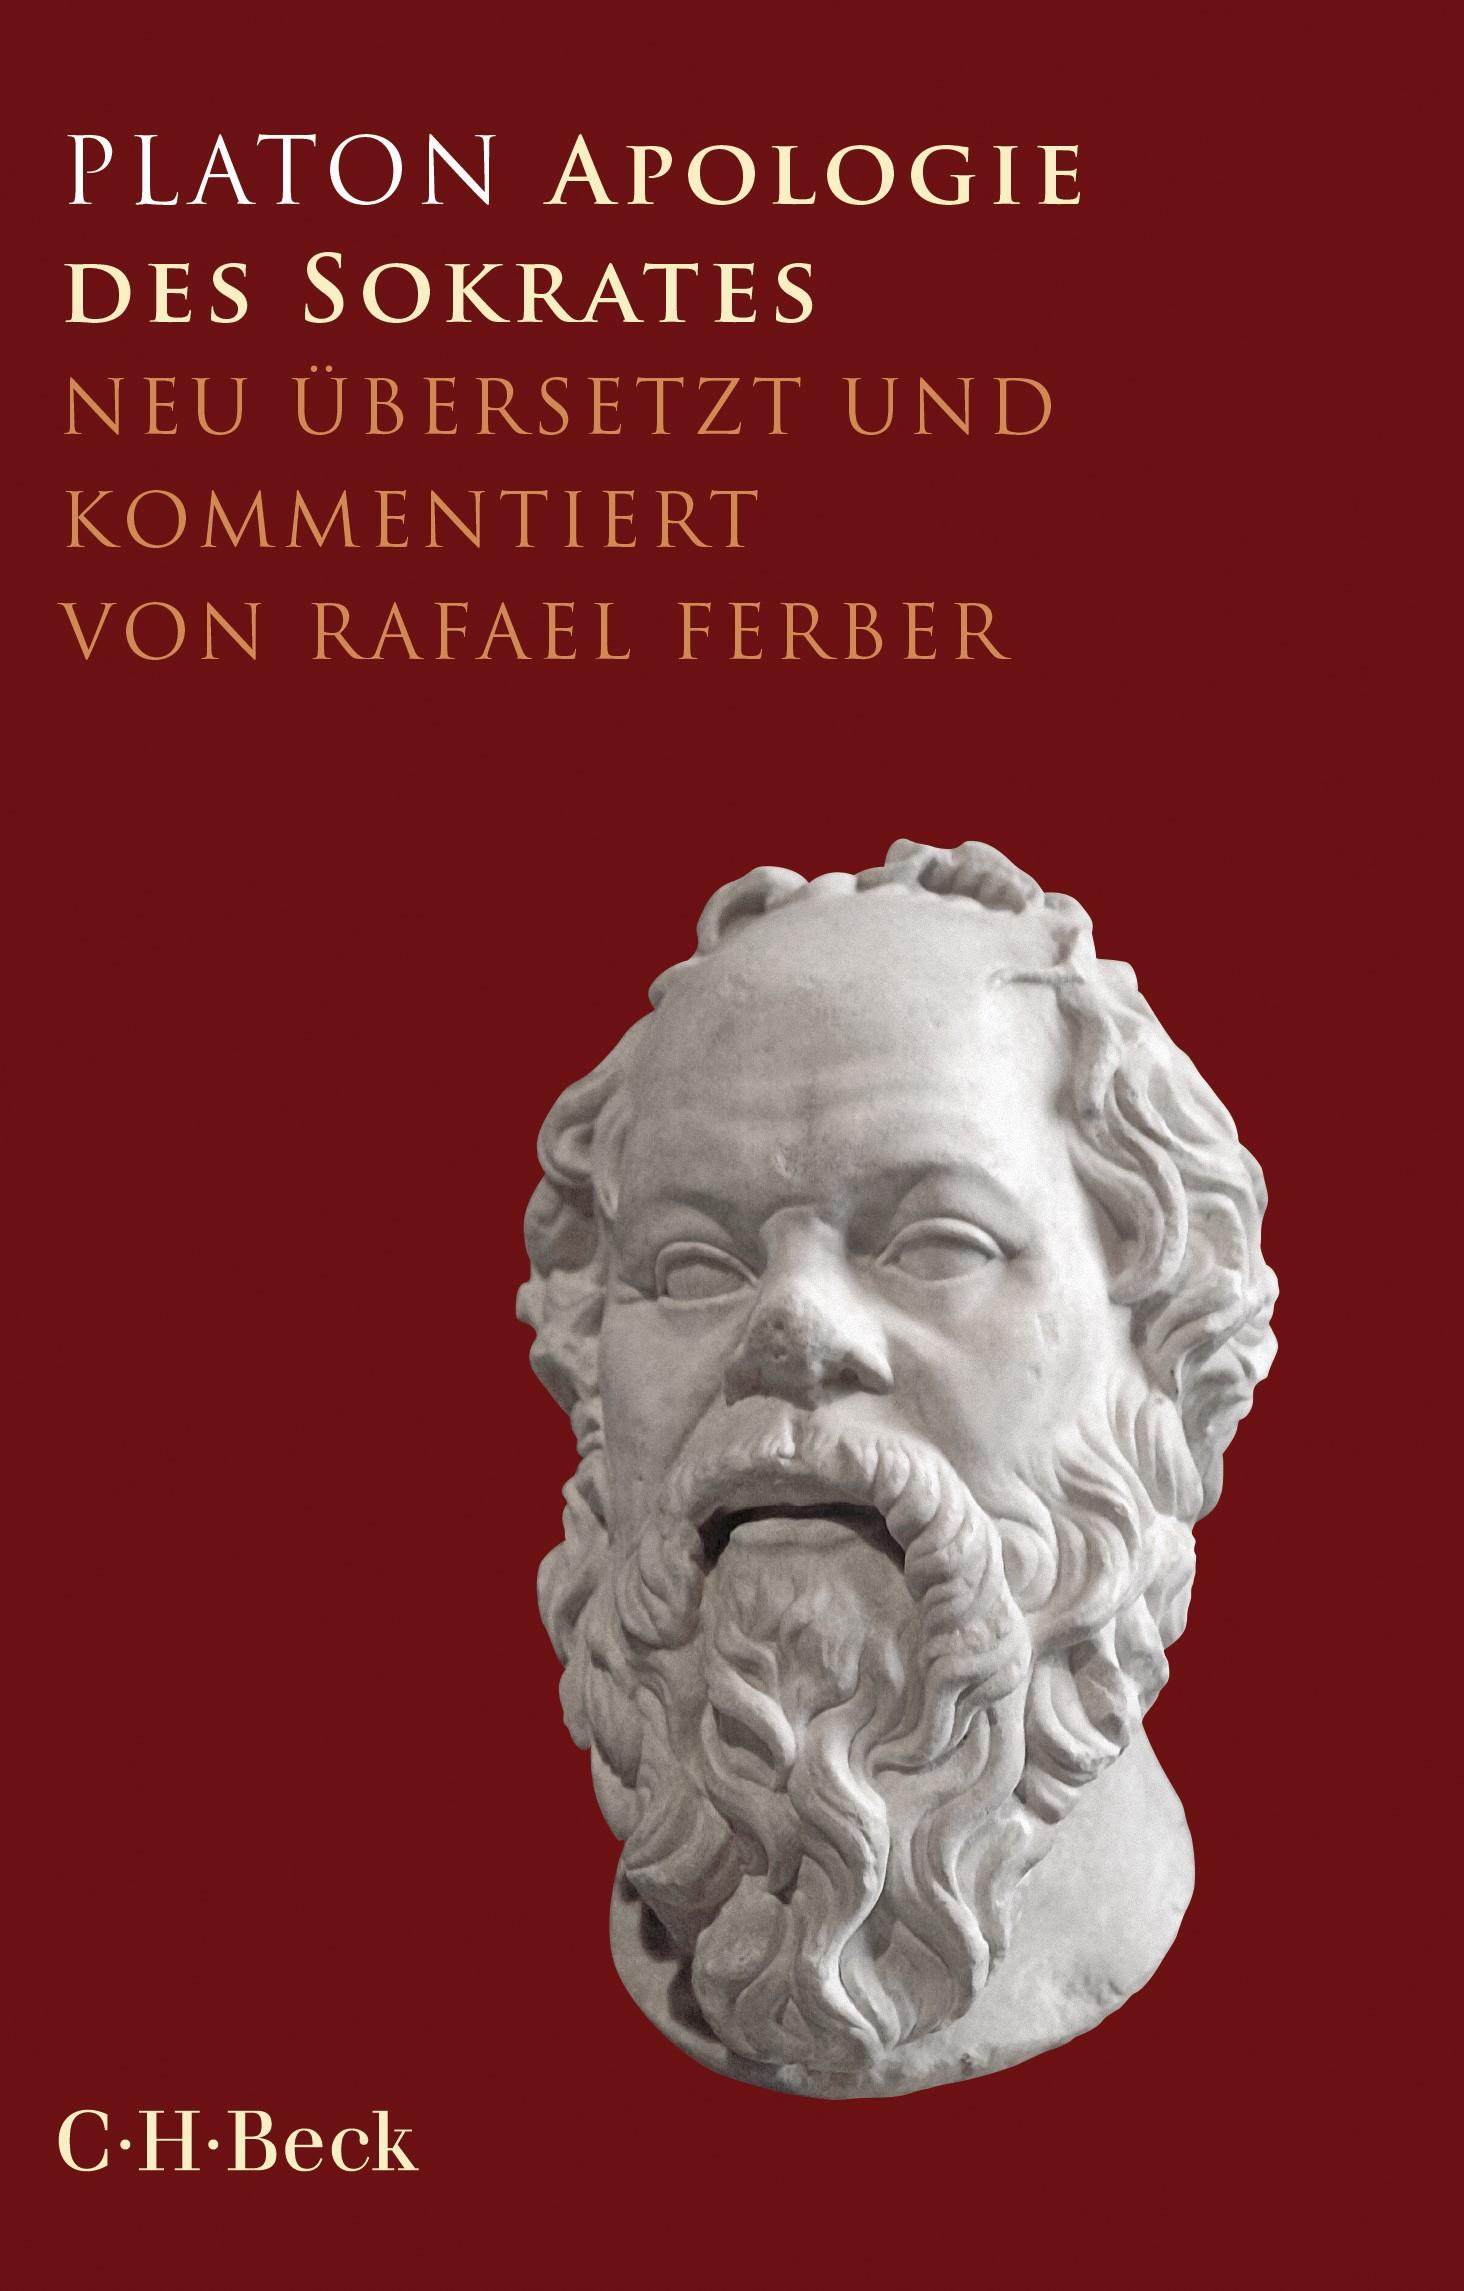 Apologie des Sokrates | Platon | 2. Auflage, 2019 | Buch (Cover)